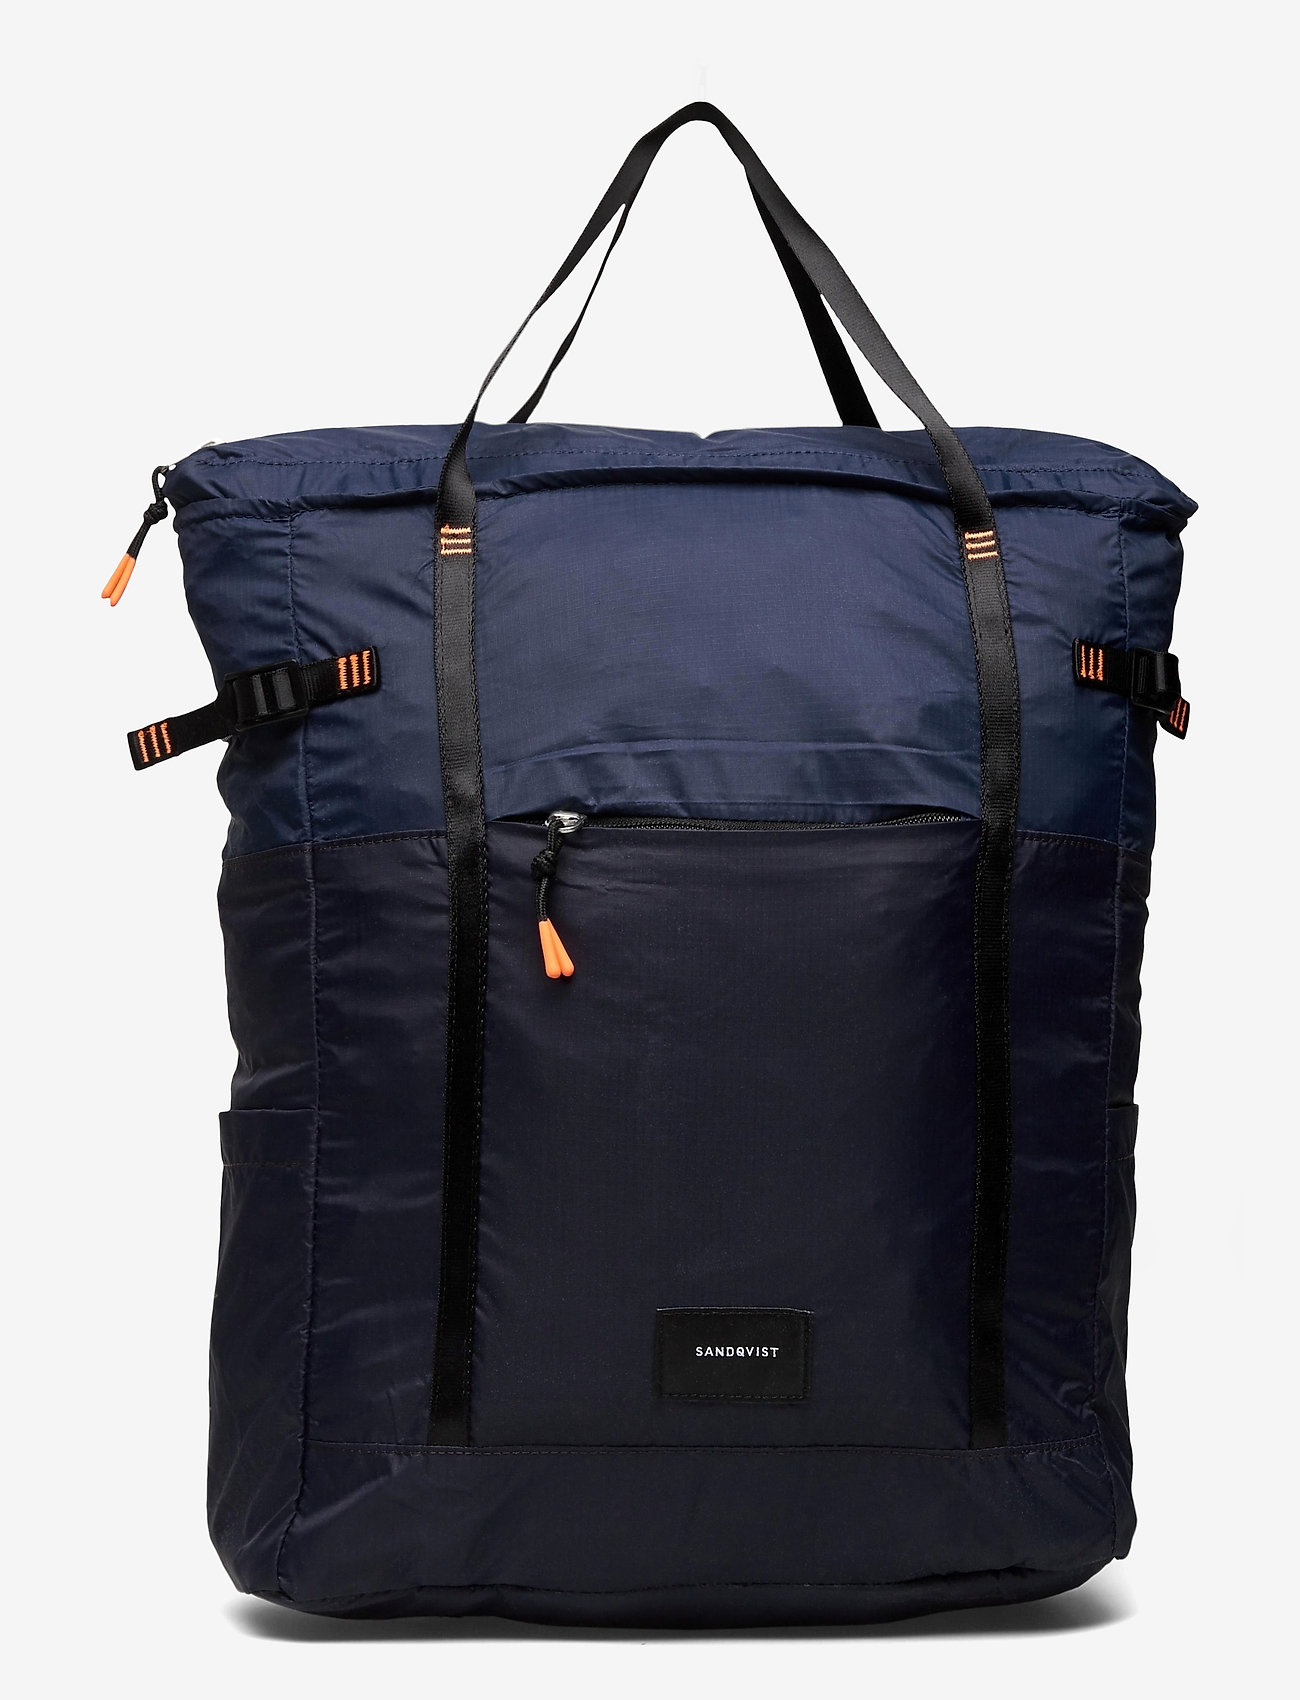 SANDQVIST - ROGER LIGHTWEIGHT - nieuwe mode - multi navy blue/evening blue - 0